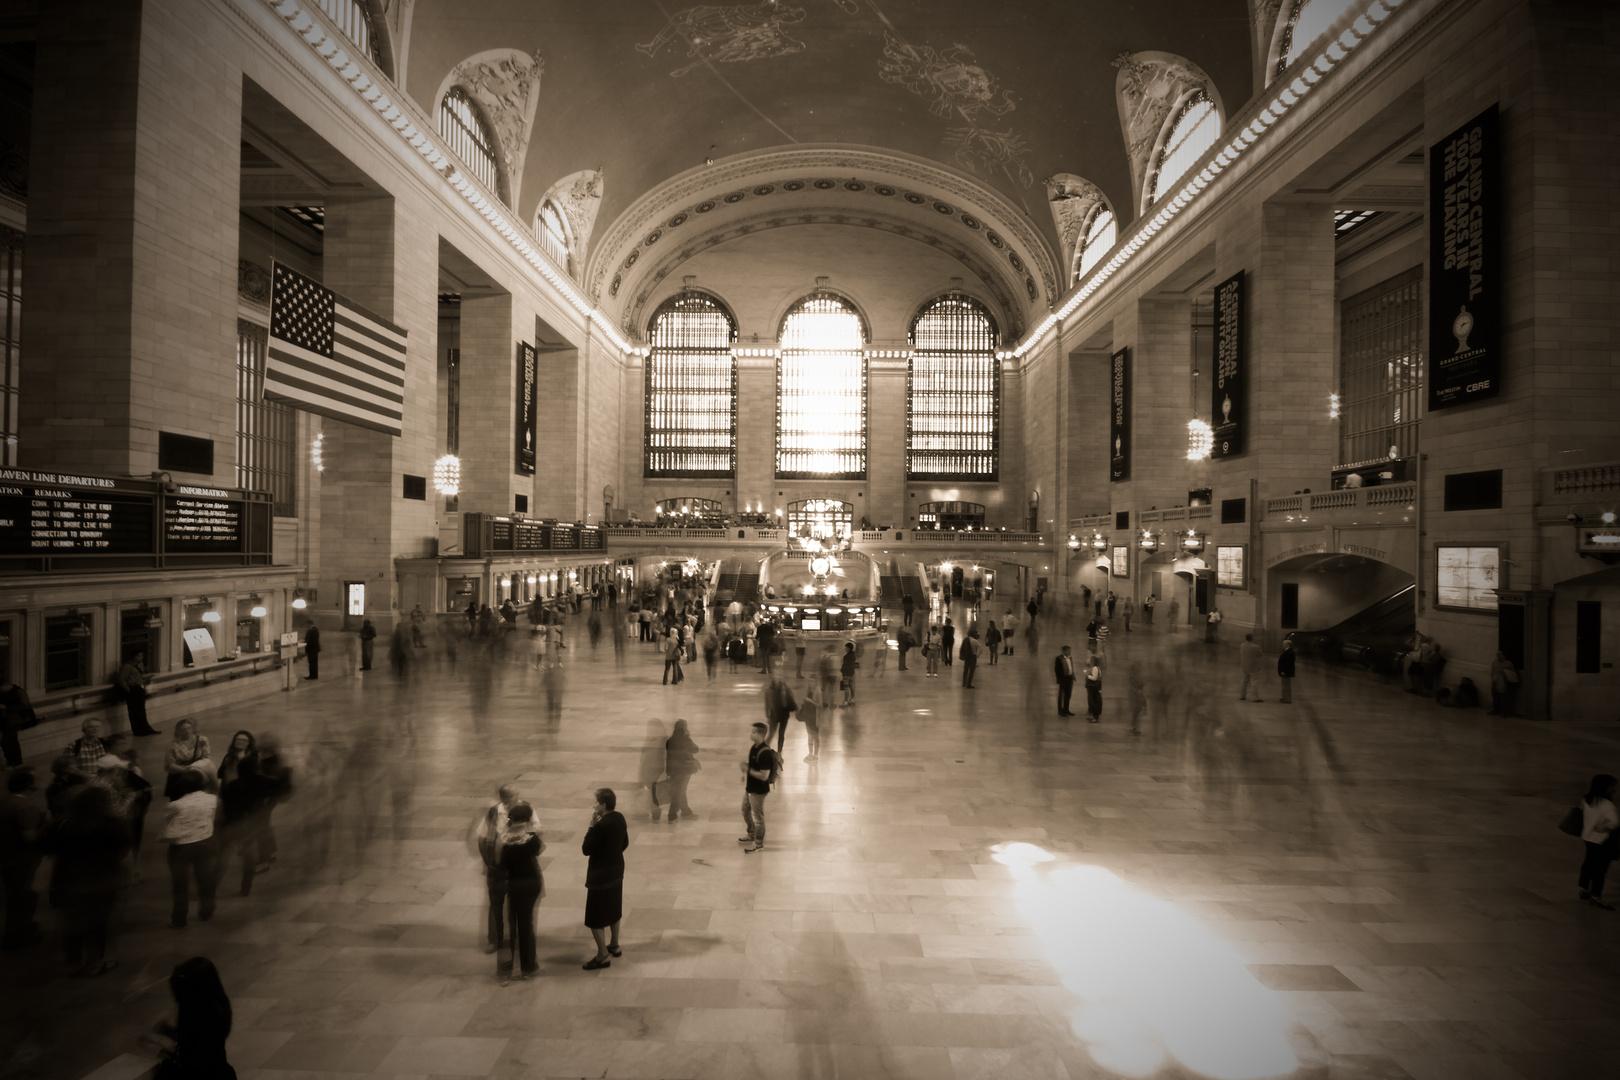 Grand Centrral Station